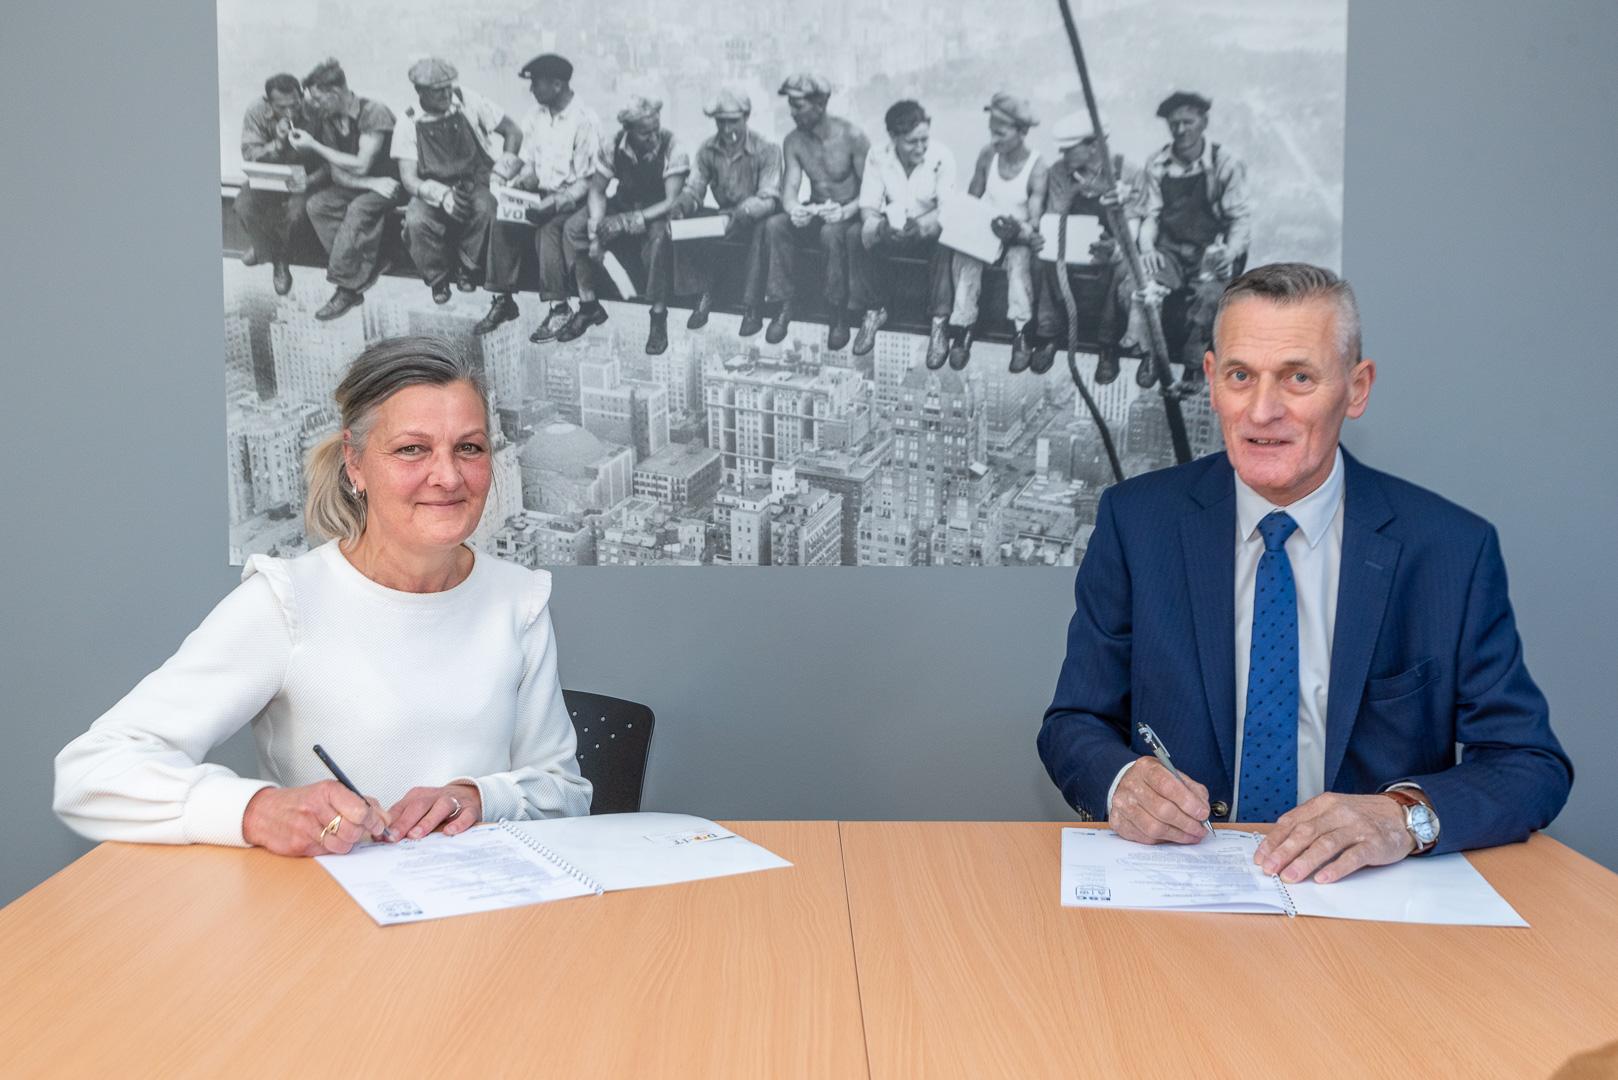 ElburgerSC - ESC verwelkomt nieuwe bordsponsor AK Blom Asbest